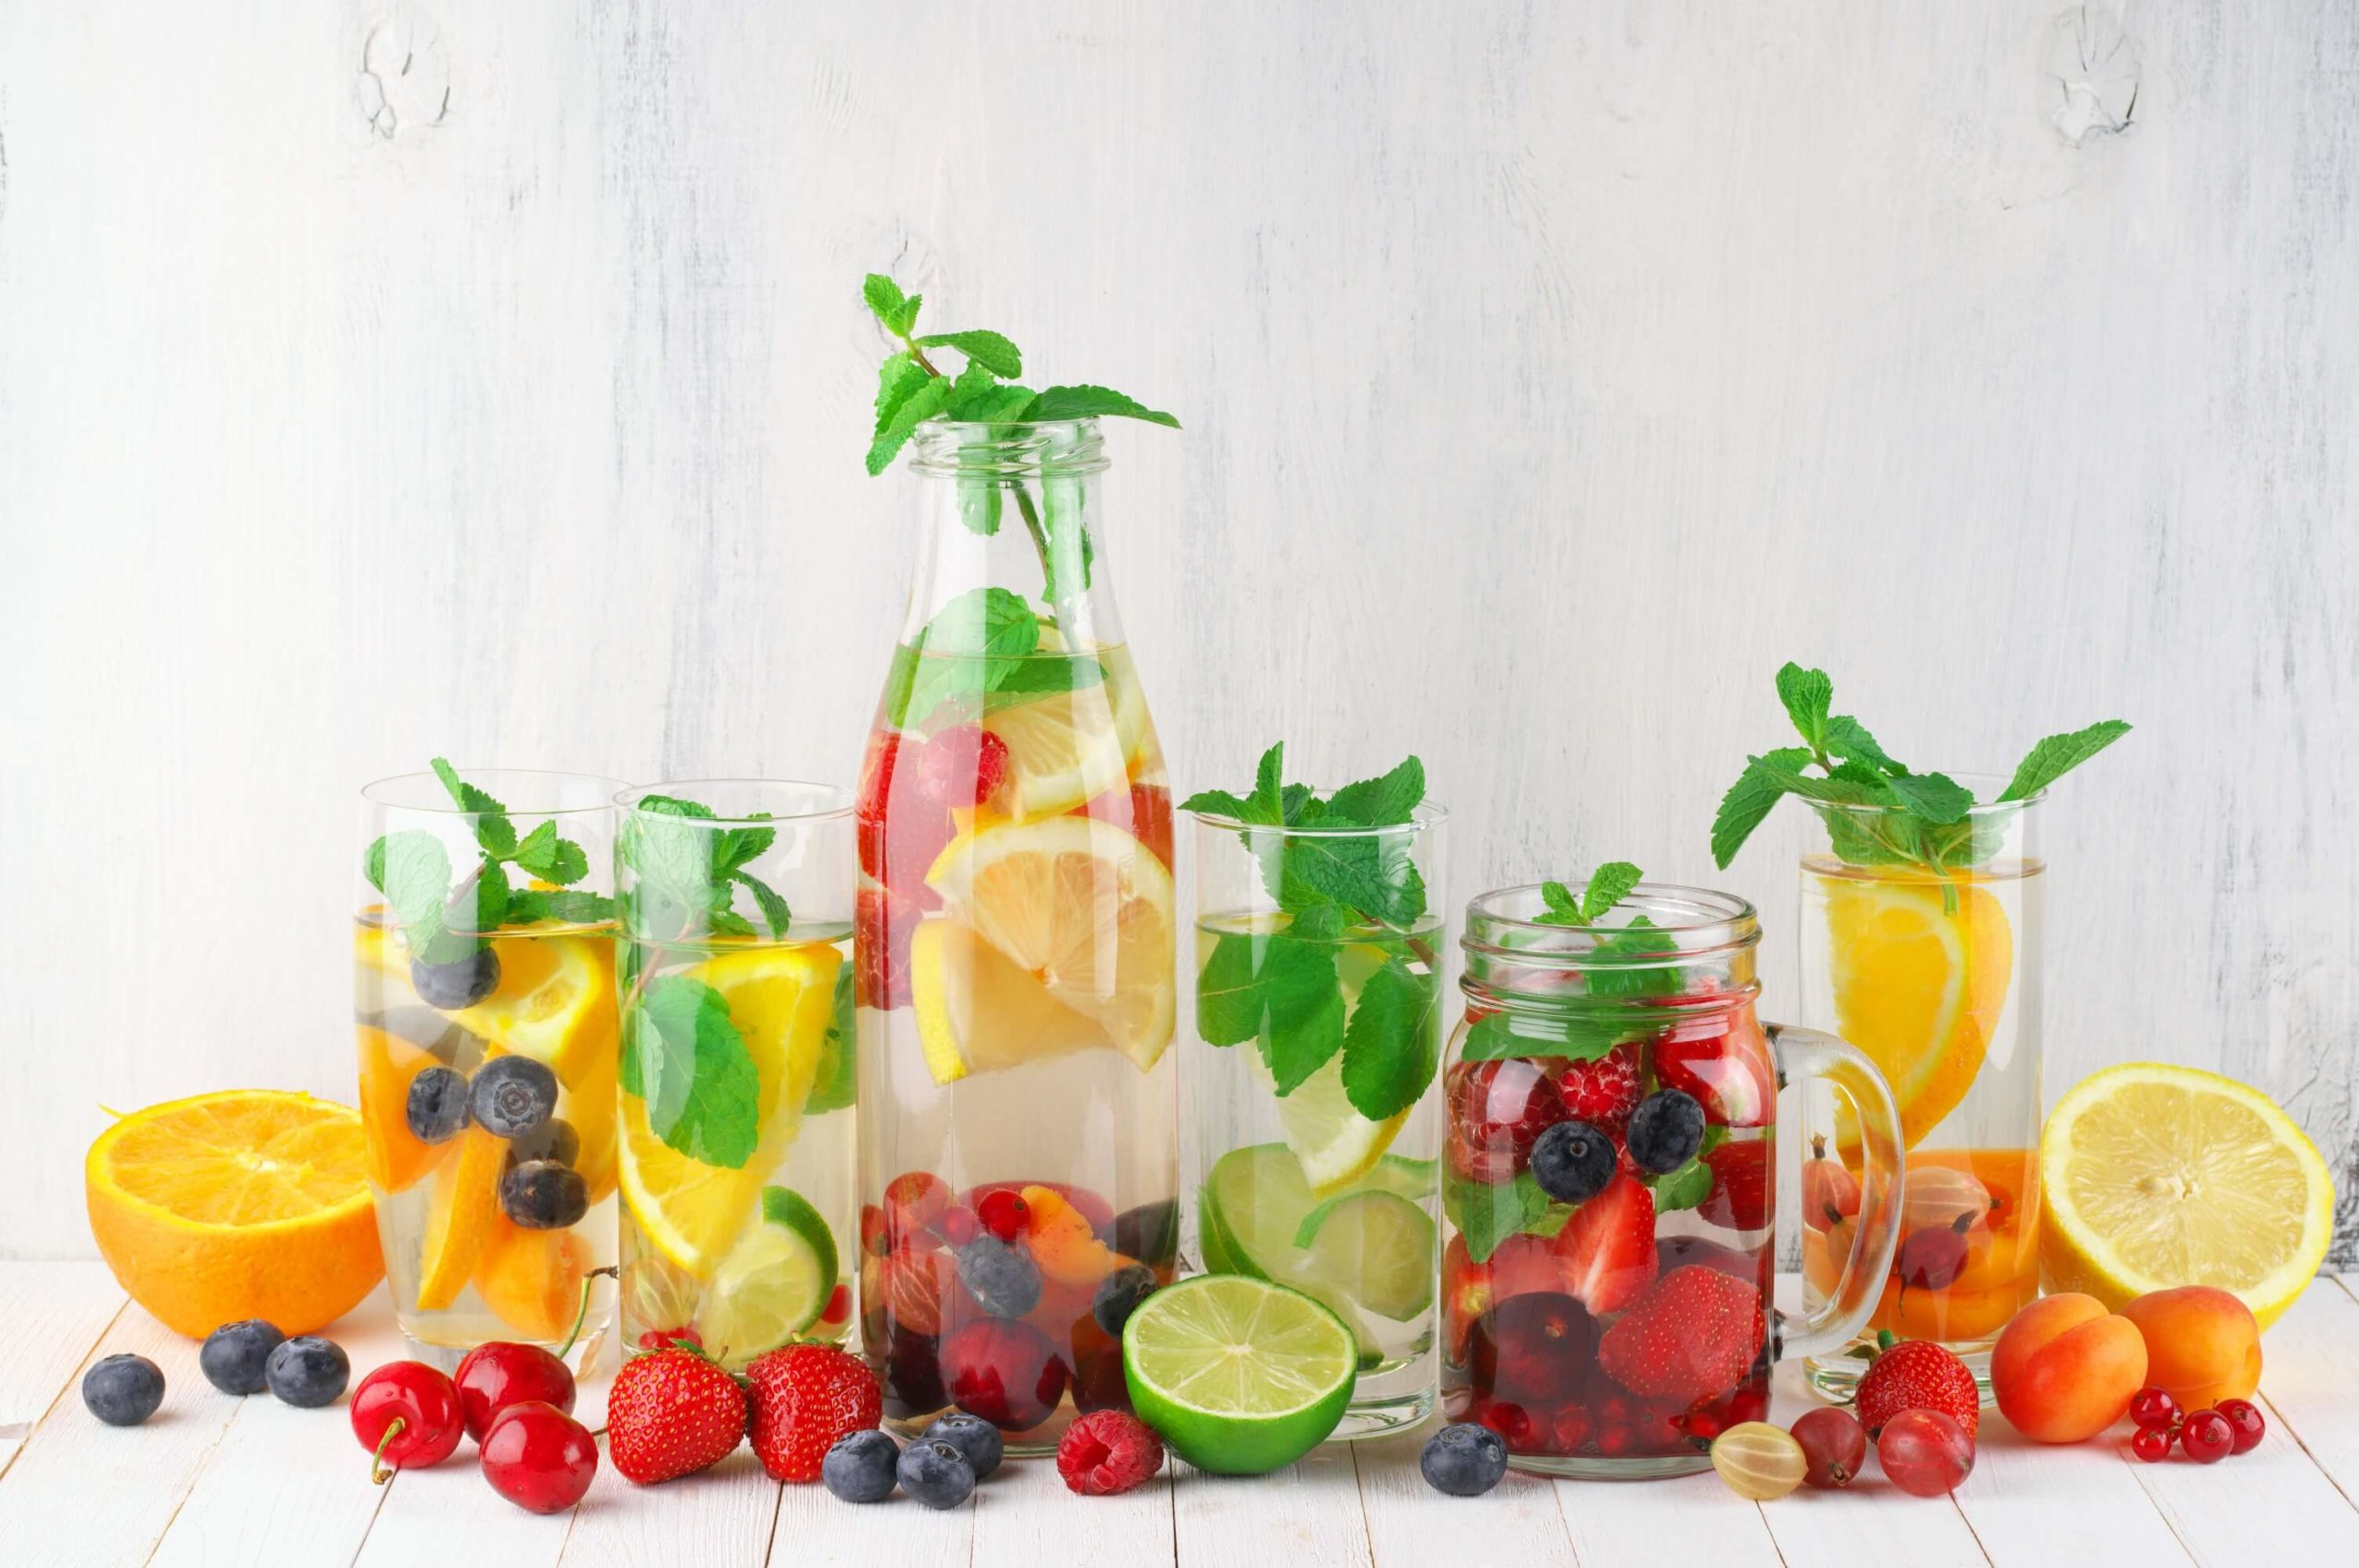 Fruit Infused Water - Wasser mit Geschmack